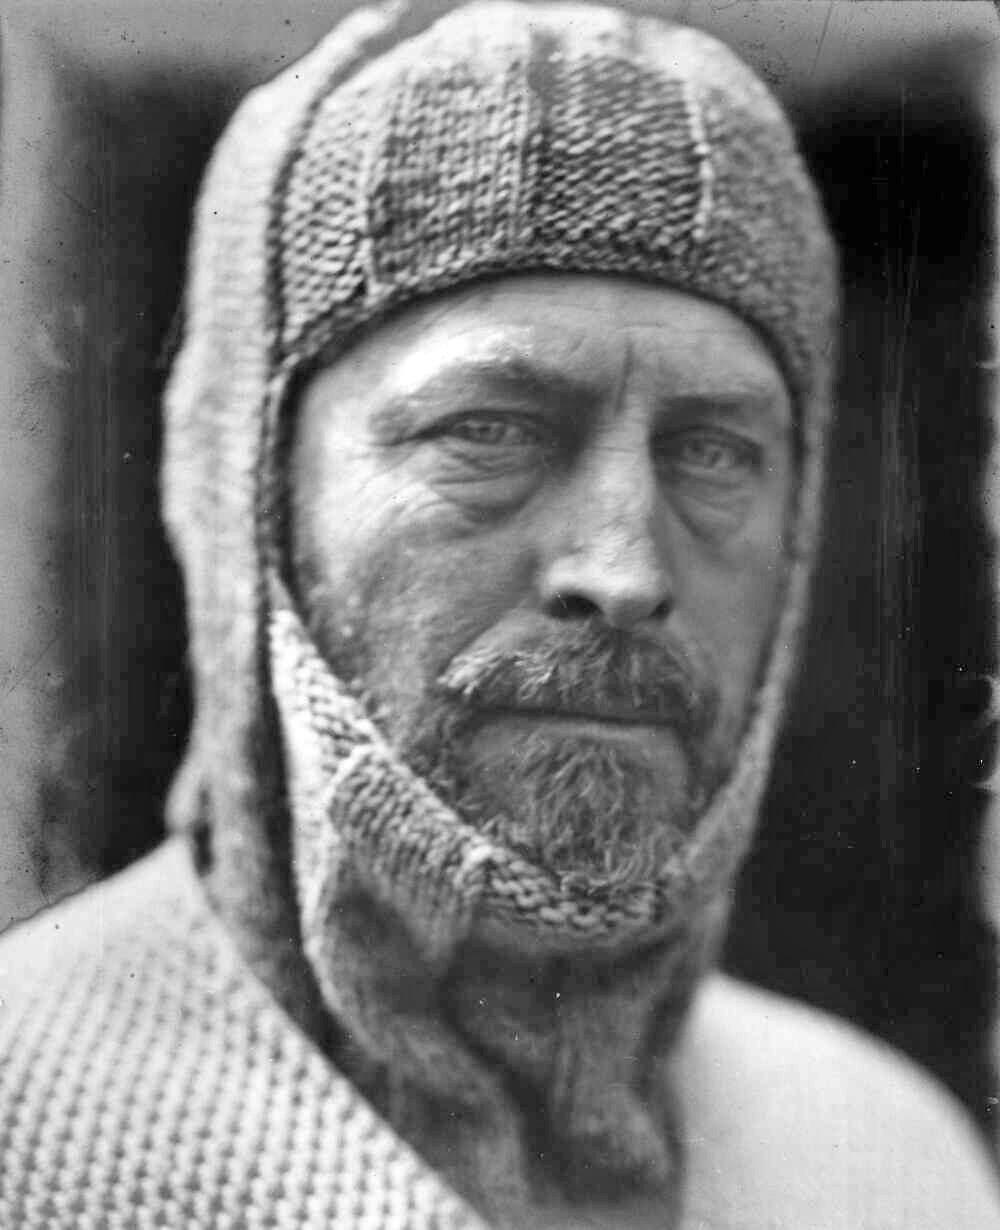 ernest shackleton nimrod british antarctic expedition